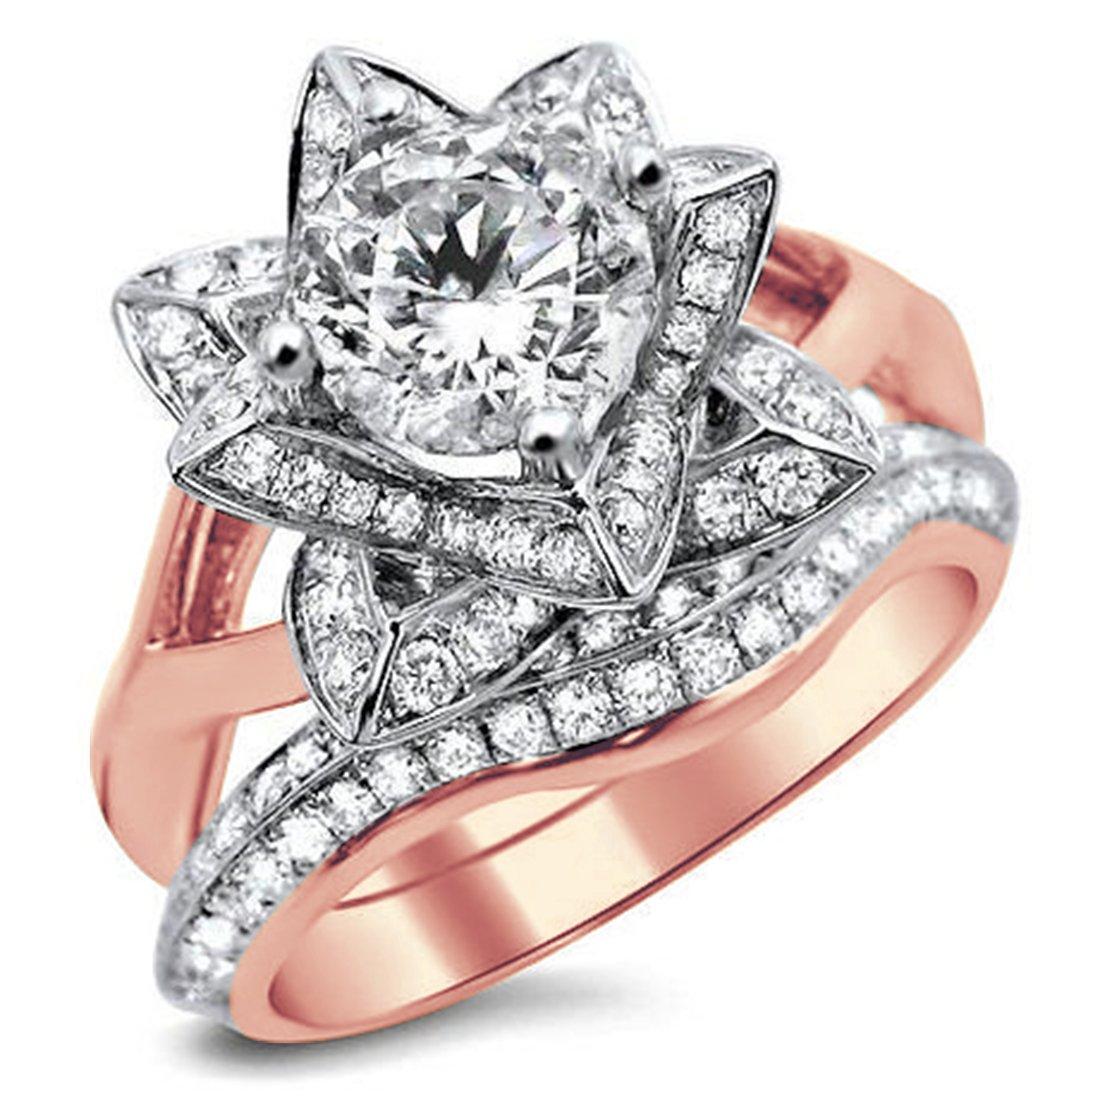 Smjewels 1.60 Ct Round Sim.Diamond Lotus Flower Engagement Ring Bridal Set In 14K Rose Gold Fn